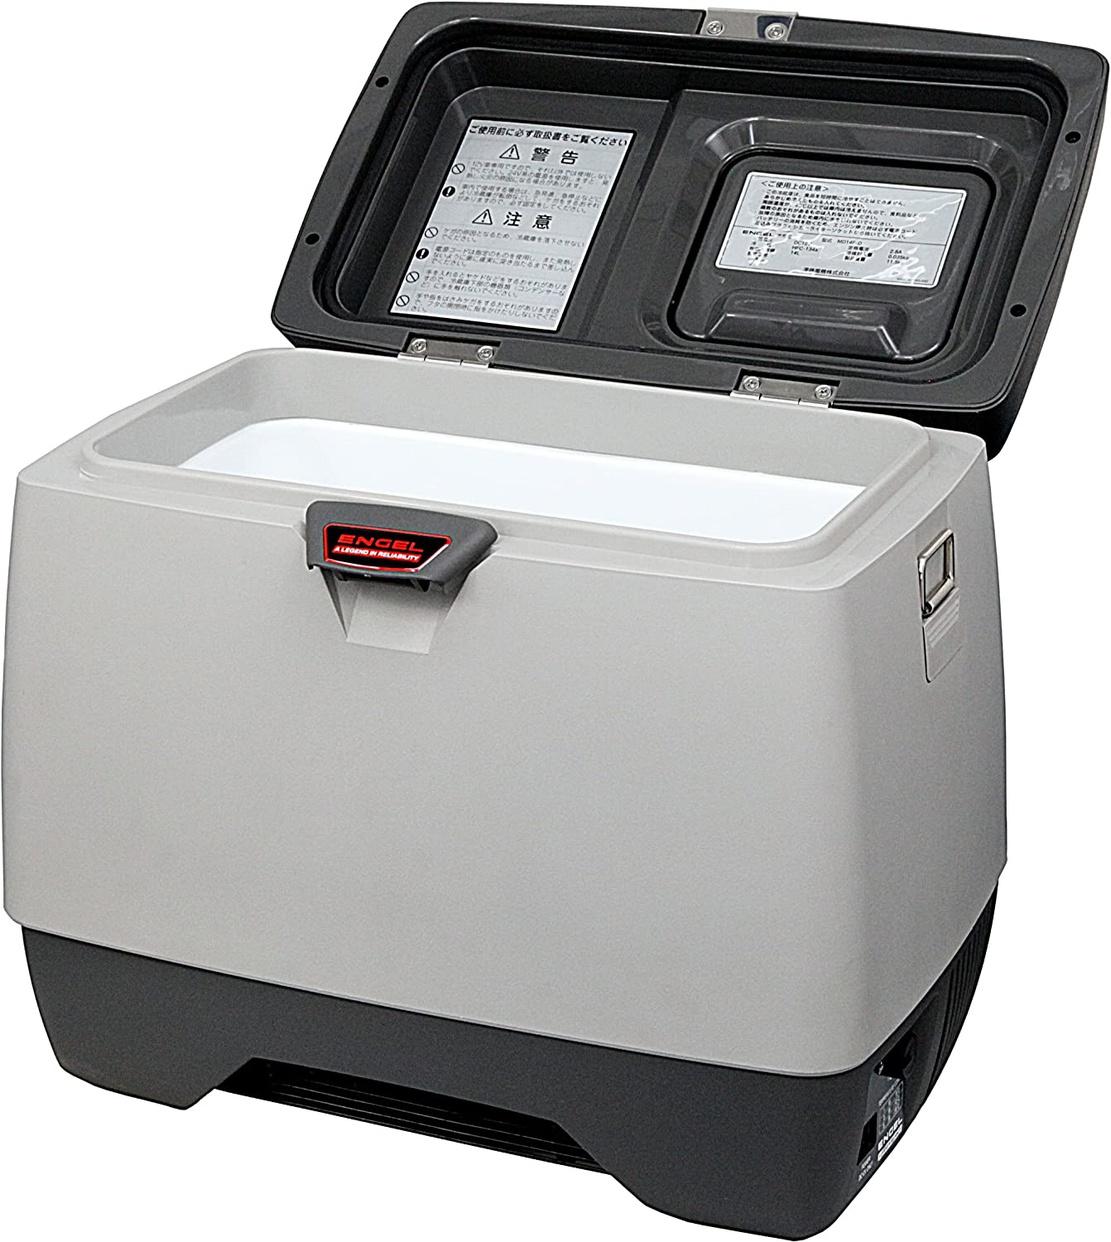 ENGEL(エンゲル) ポータブル冷凍冷蔵庫 MD14F MD14Fの商品画像4